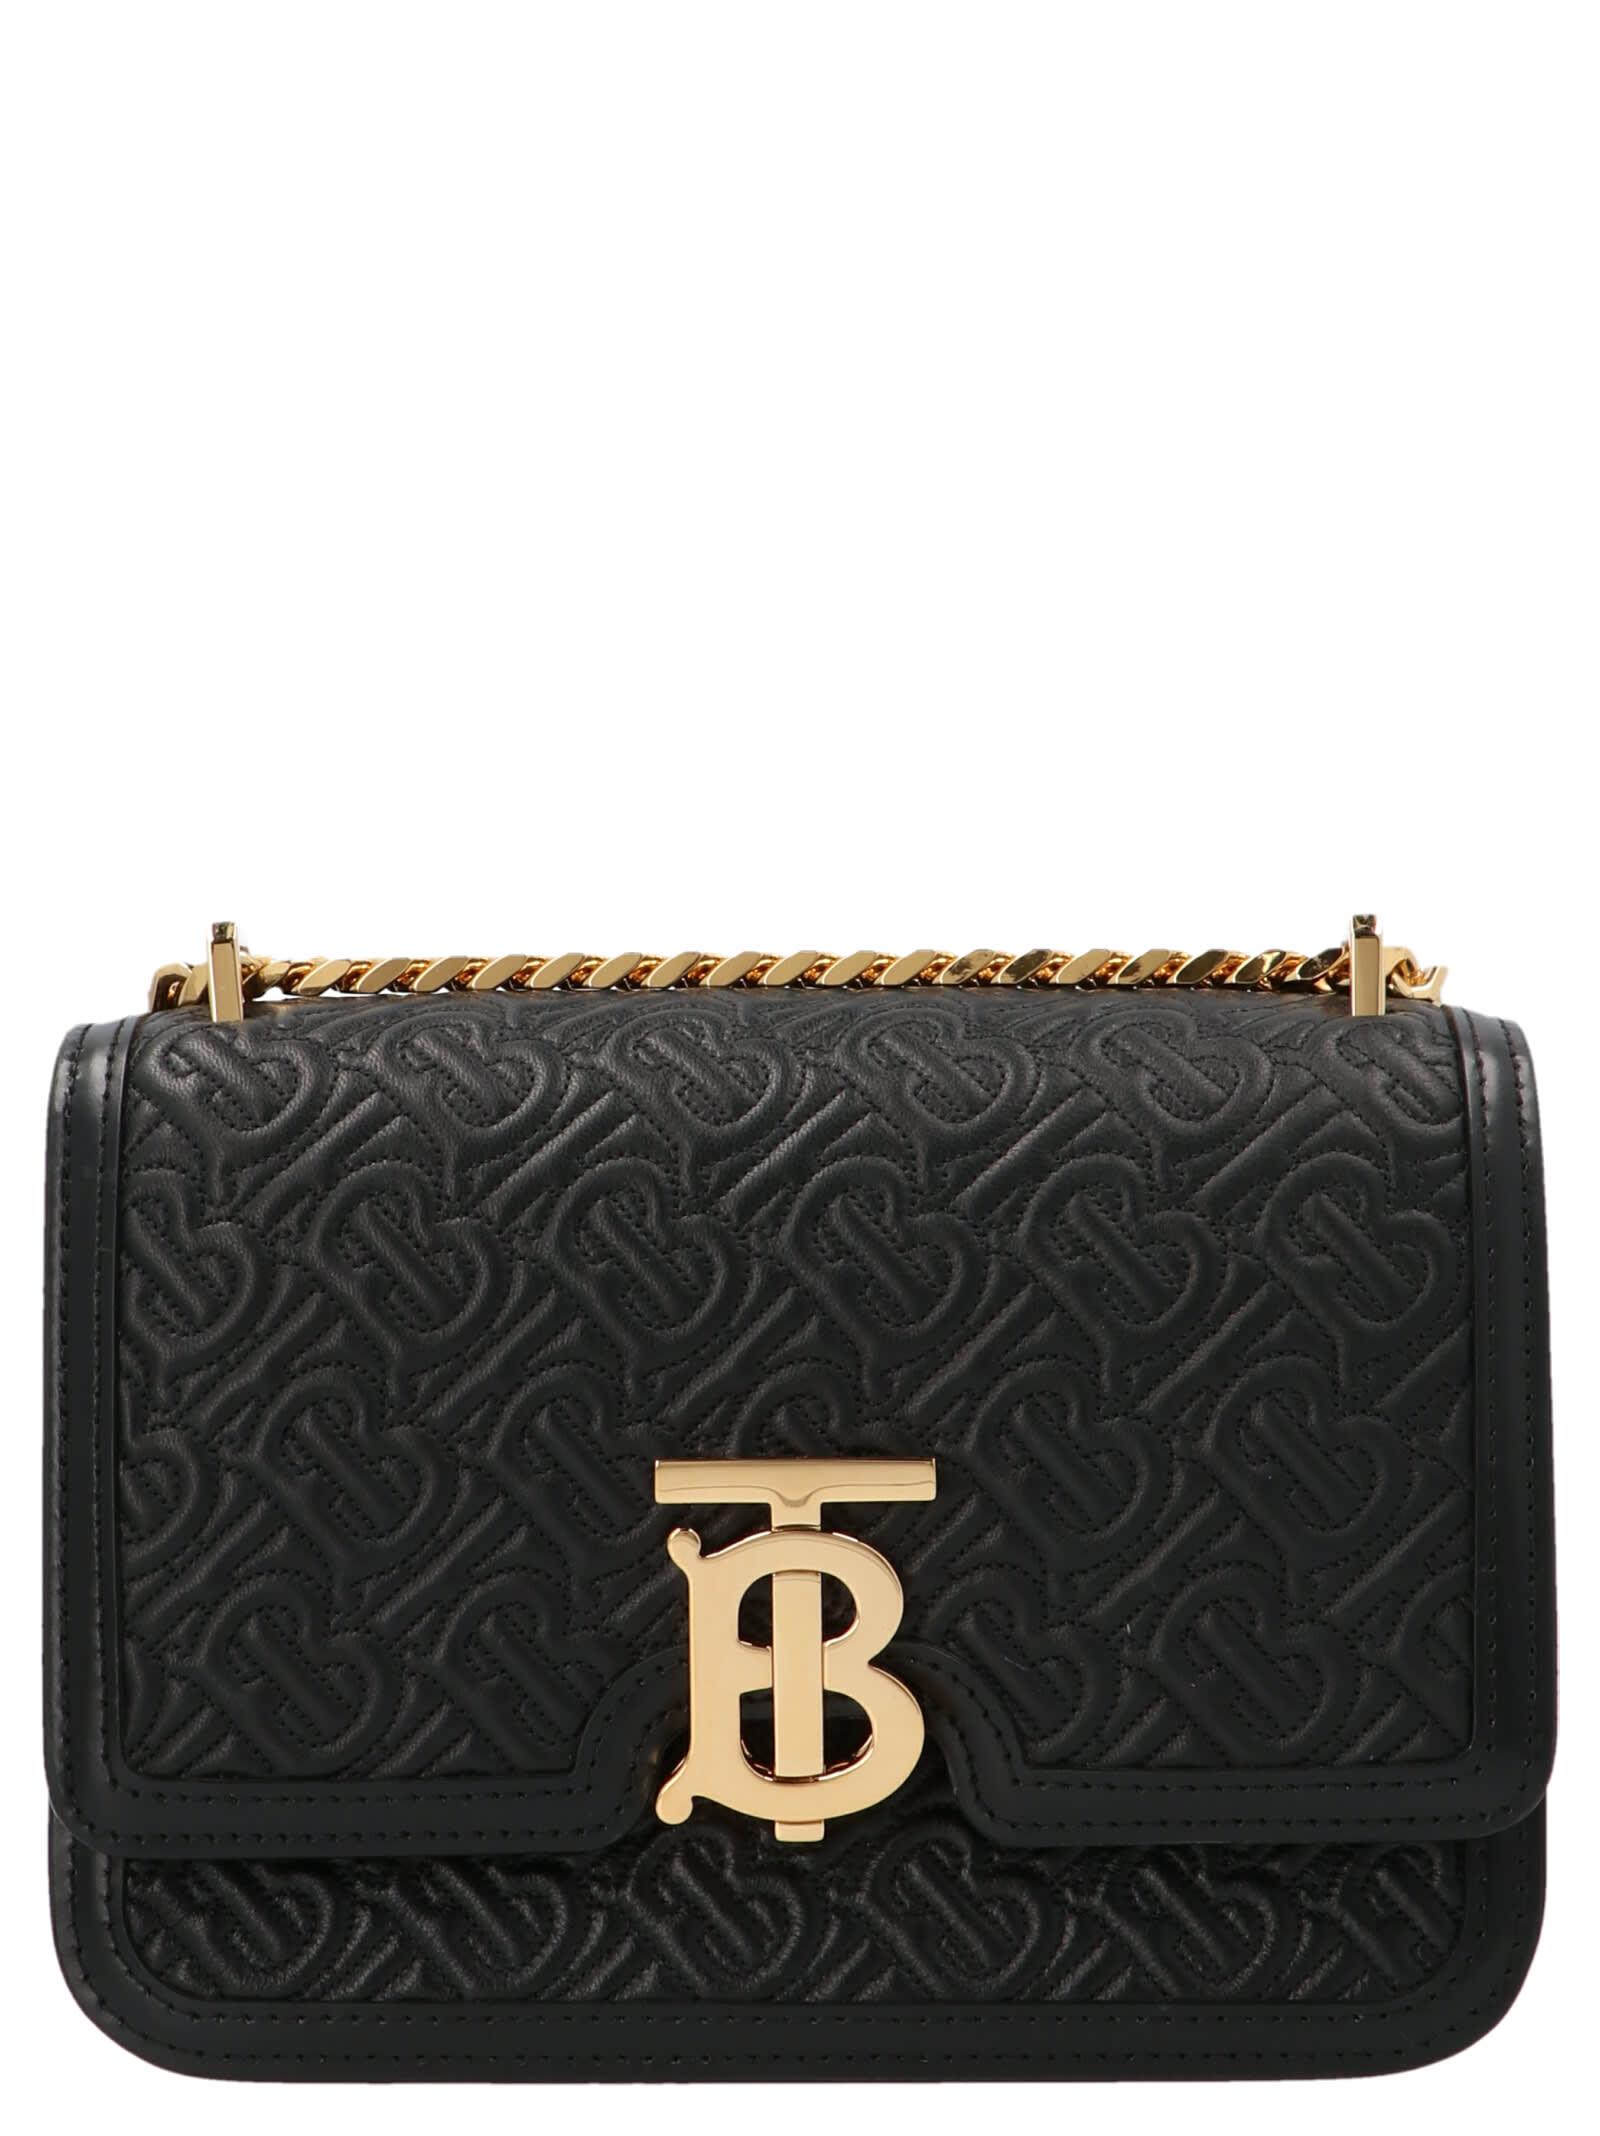 Burberry Tb Bag Bag In Black